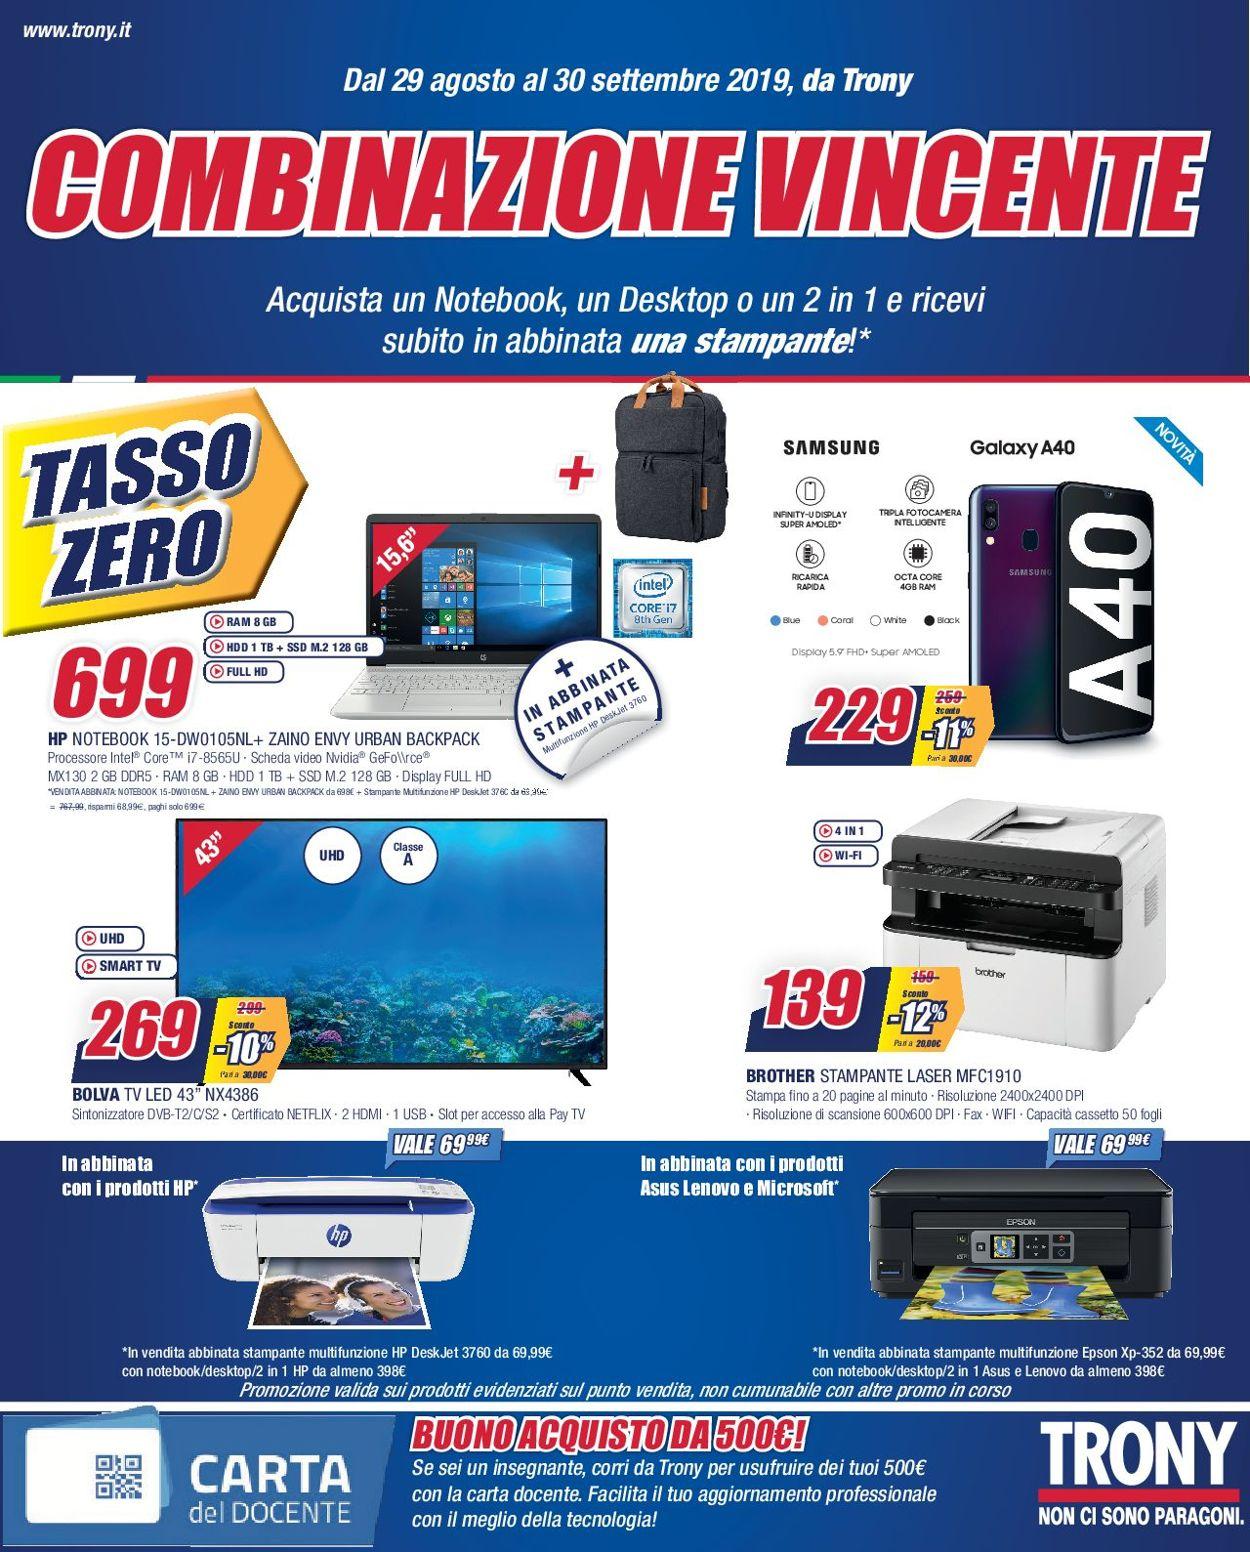 Volantino Trony - Offerte 29/08-30/09/2019